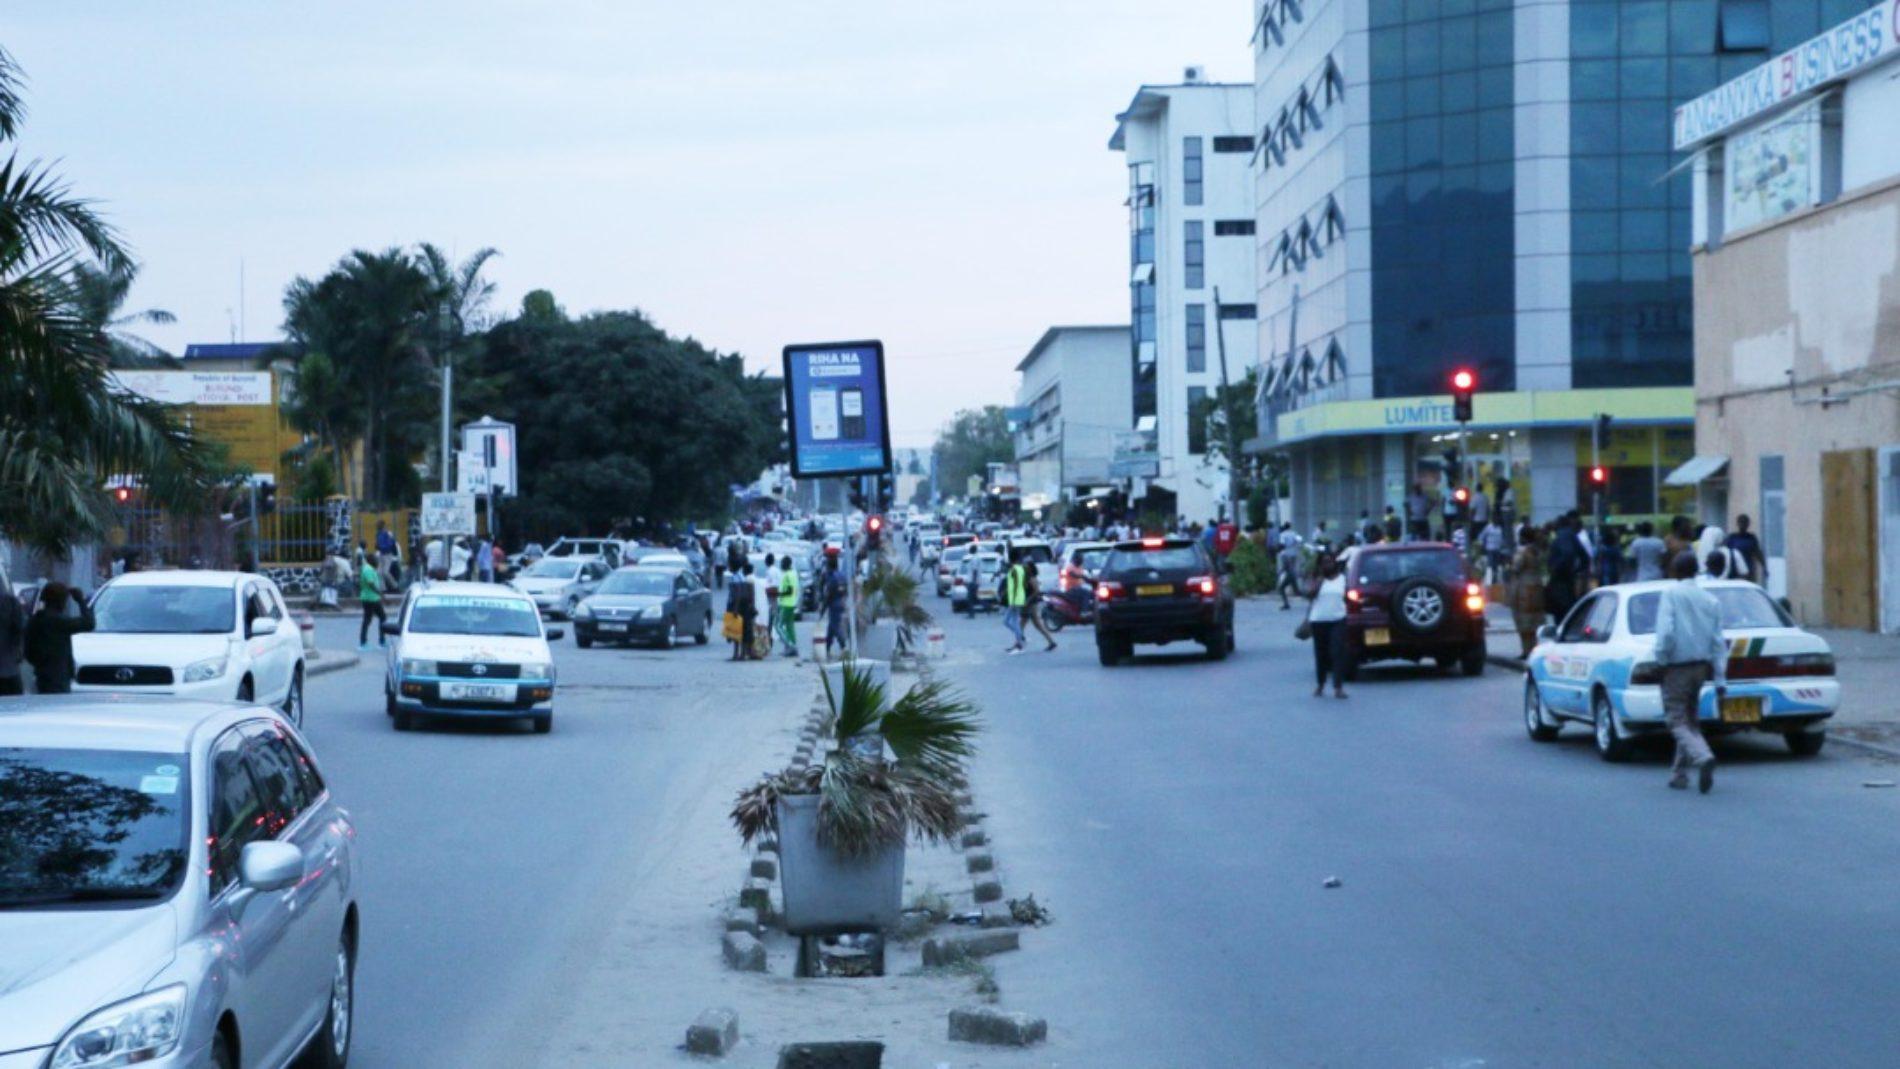 Mort du président Nkurunziza : Bujumbura «comme un jour normal» (témoignages)